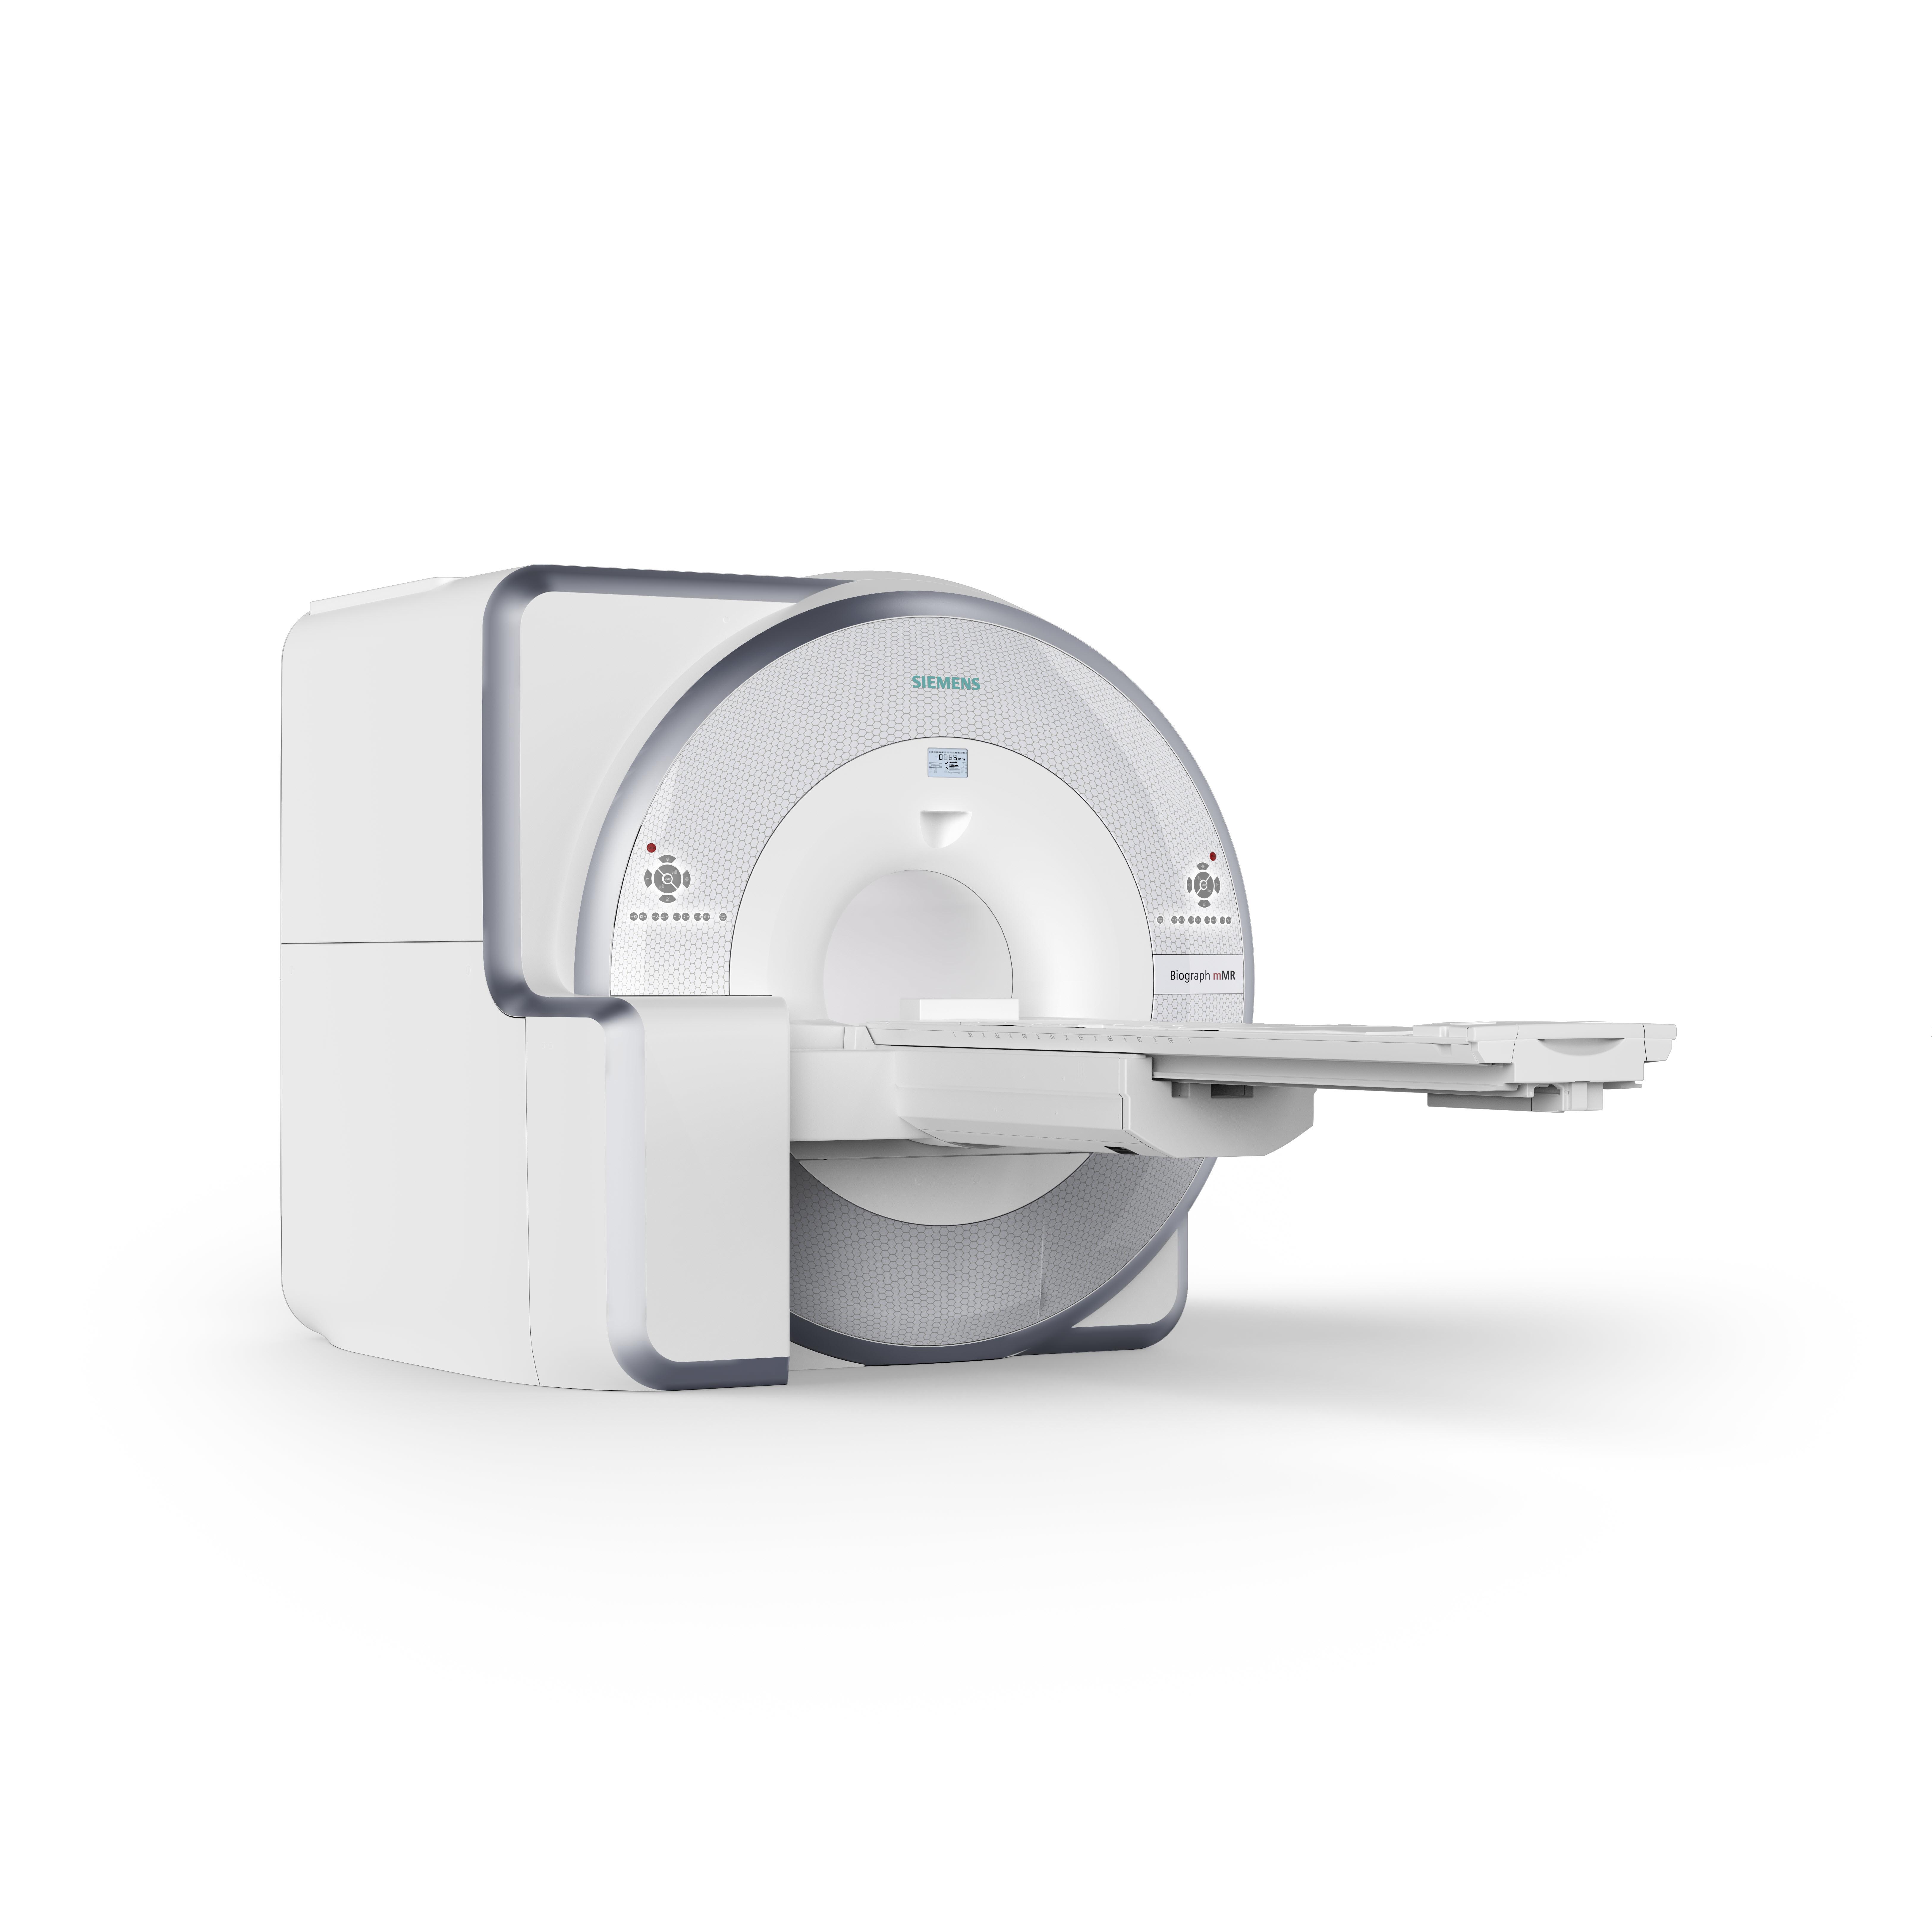 Biograph mMR Cardiac PET Alignment with MRAC Job Aid